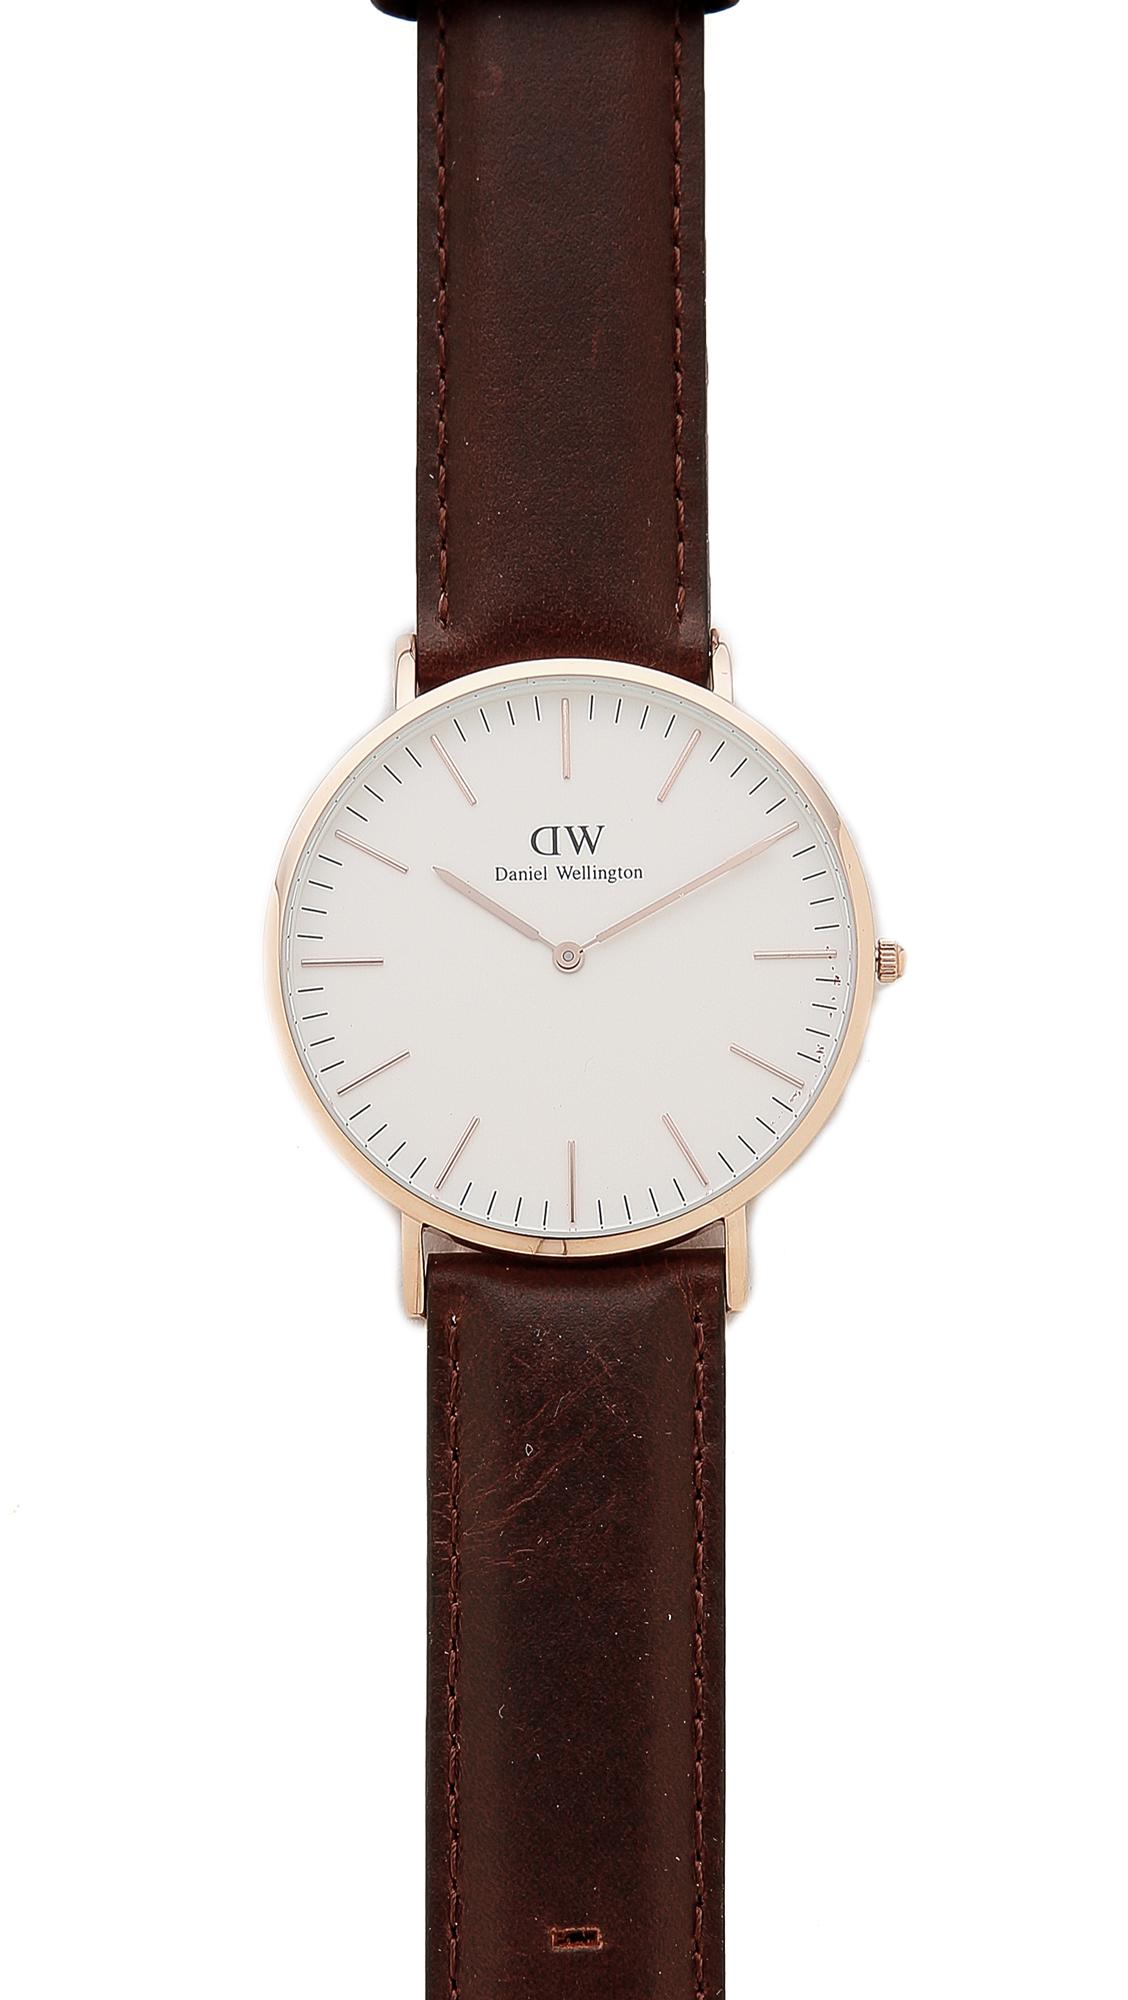 daniel wellington bristol watch with 40mm white dial. Black Bedroom Furniture Sets. Home Design Ideas